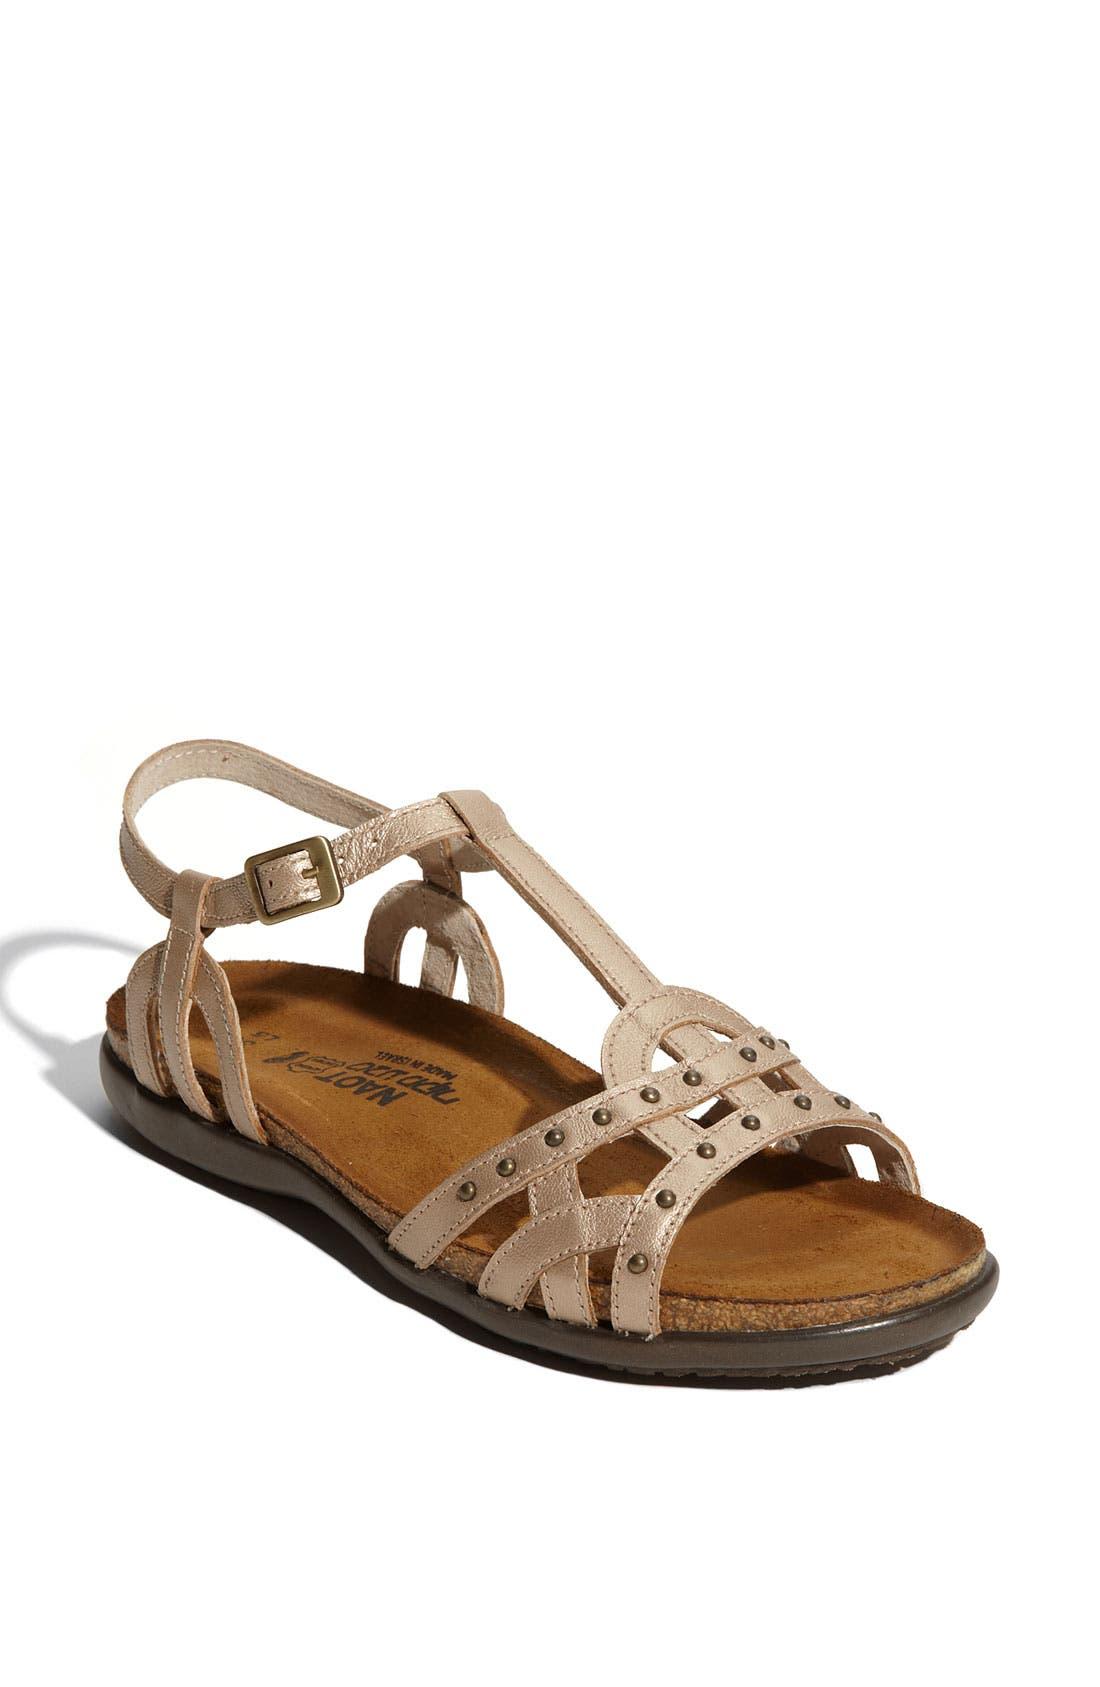 Main Image - Naot 'Elinor' Sandal